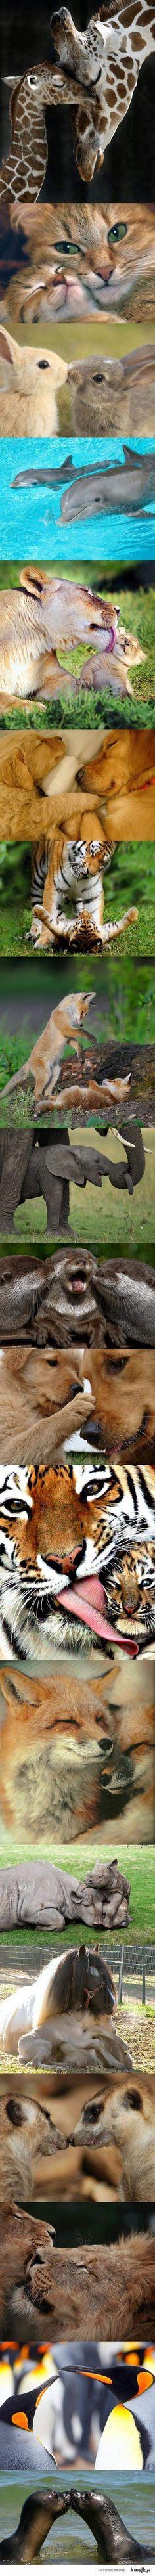 Animal's love